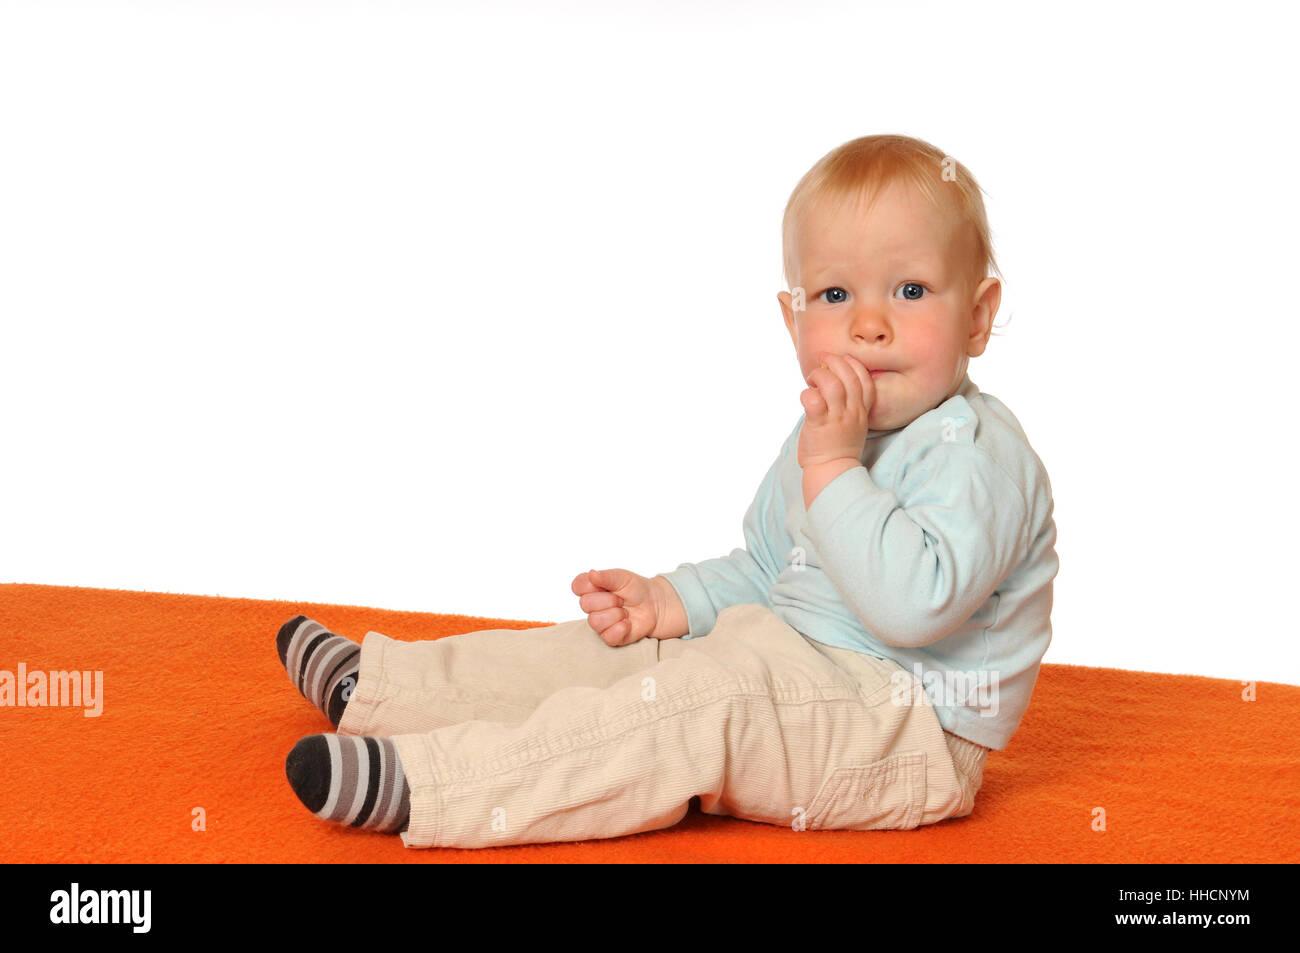 optional, baby, eating, eat, eats, isolated, optional, scrabble, crawling, Stock Photo